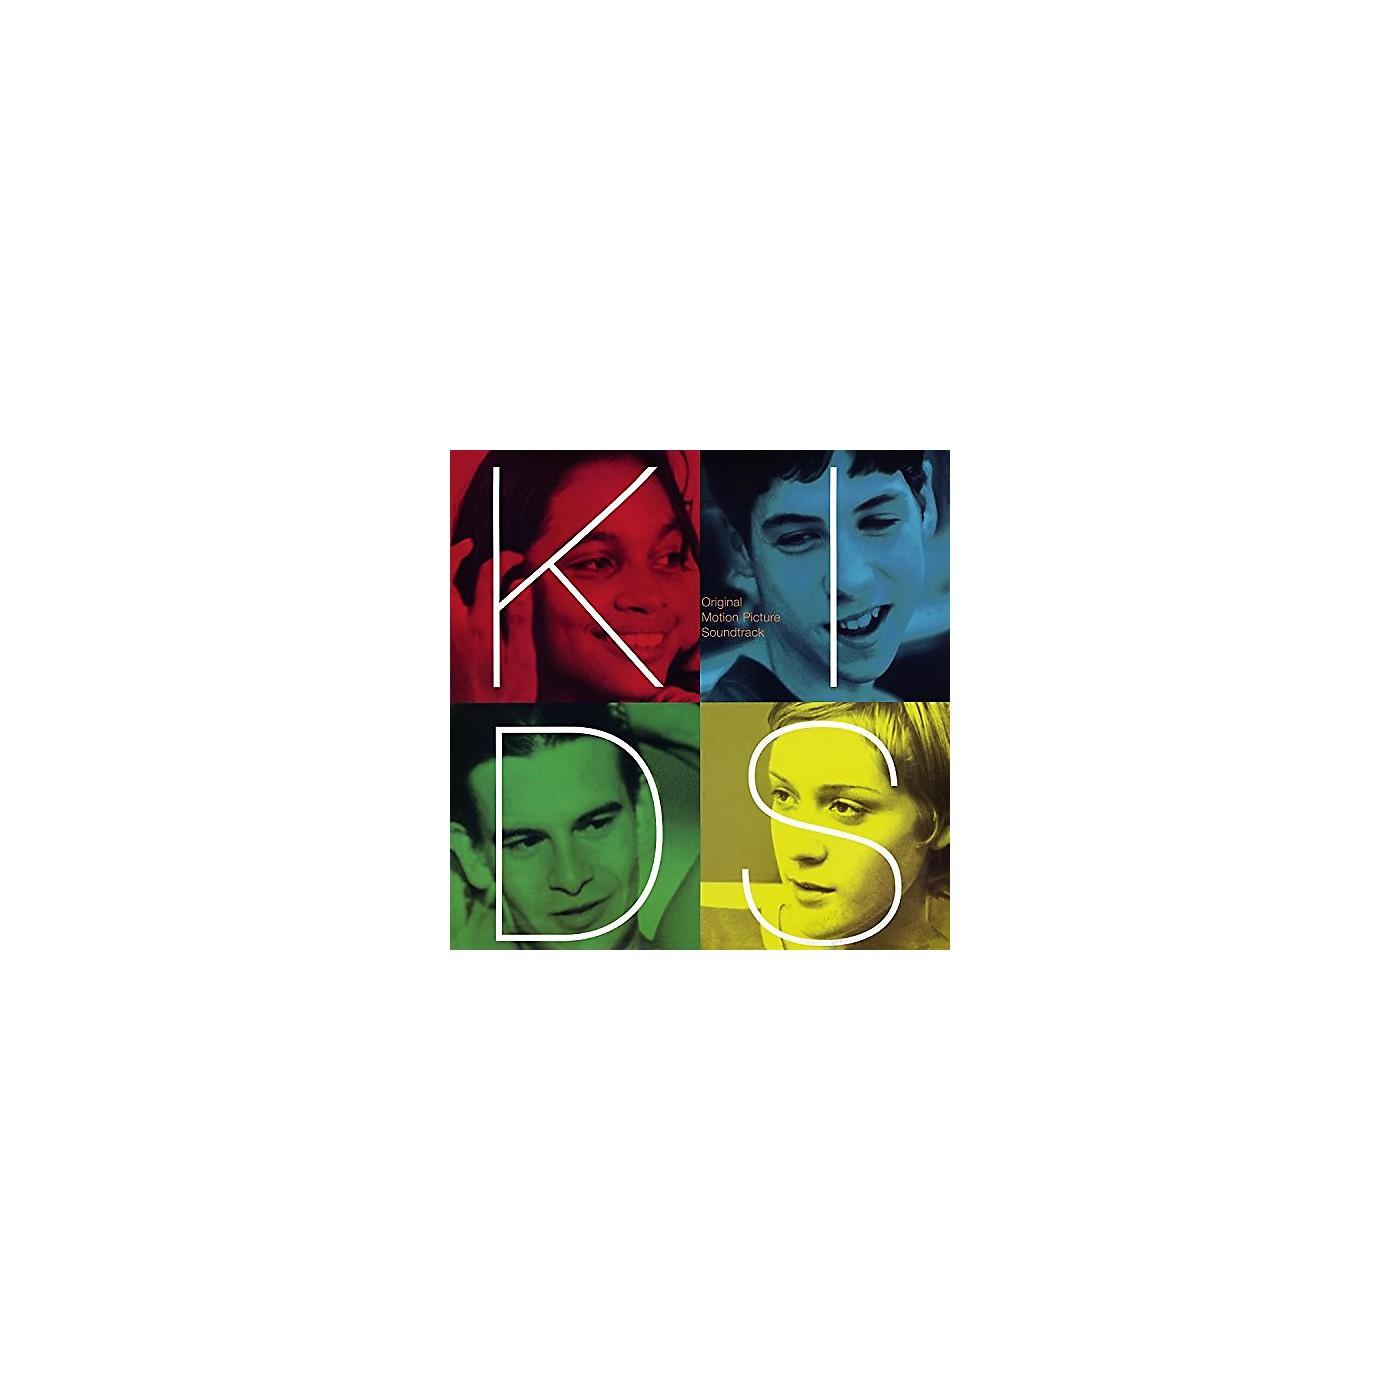 Alliance Kids / O.s.t. thumbnail